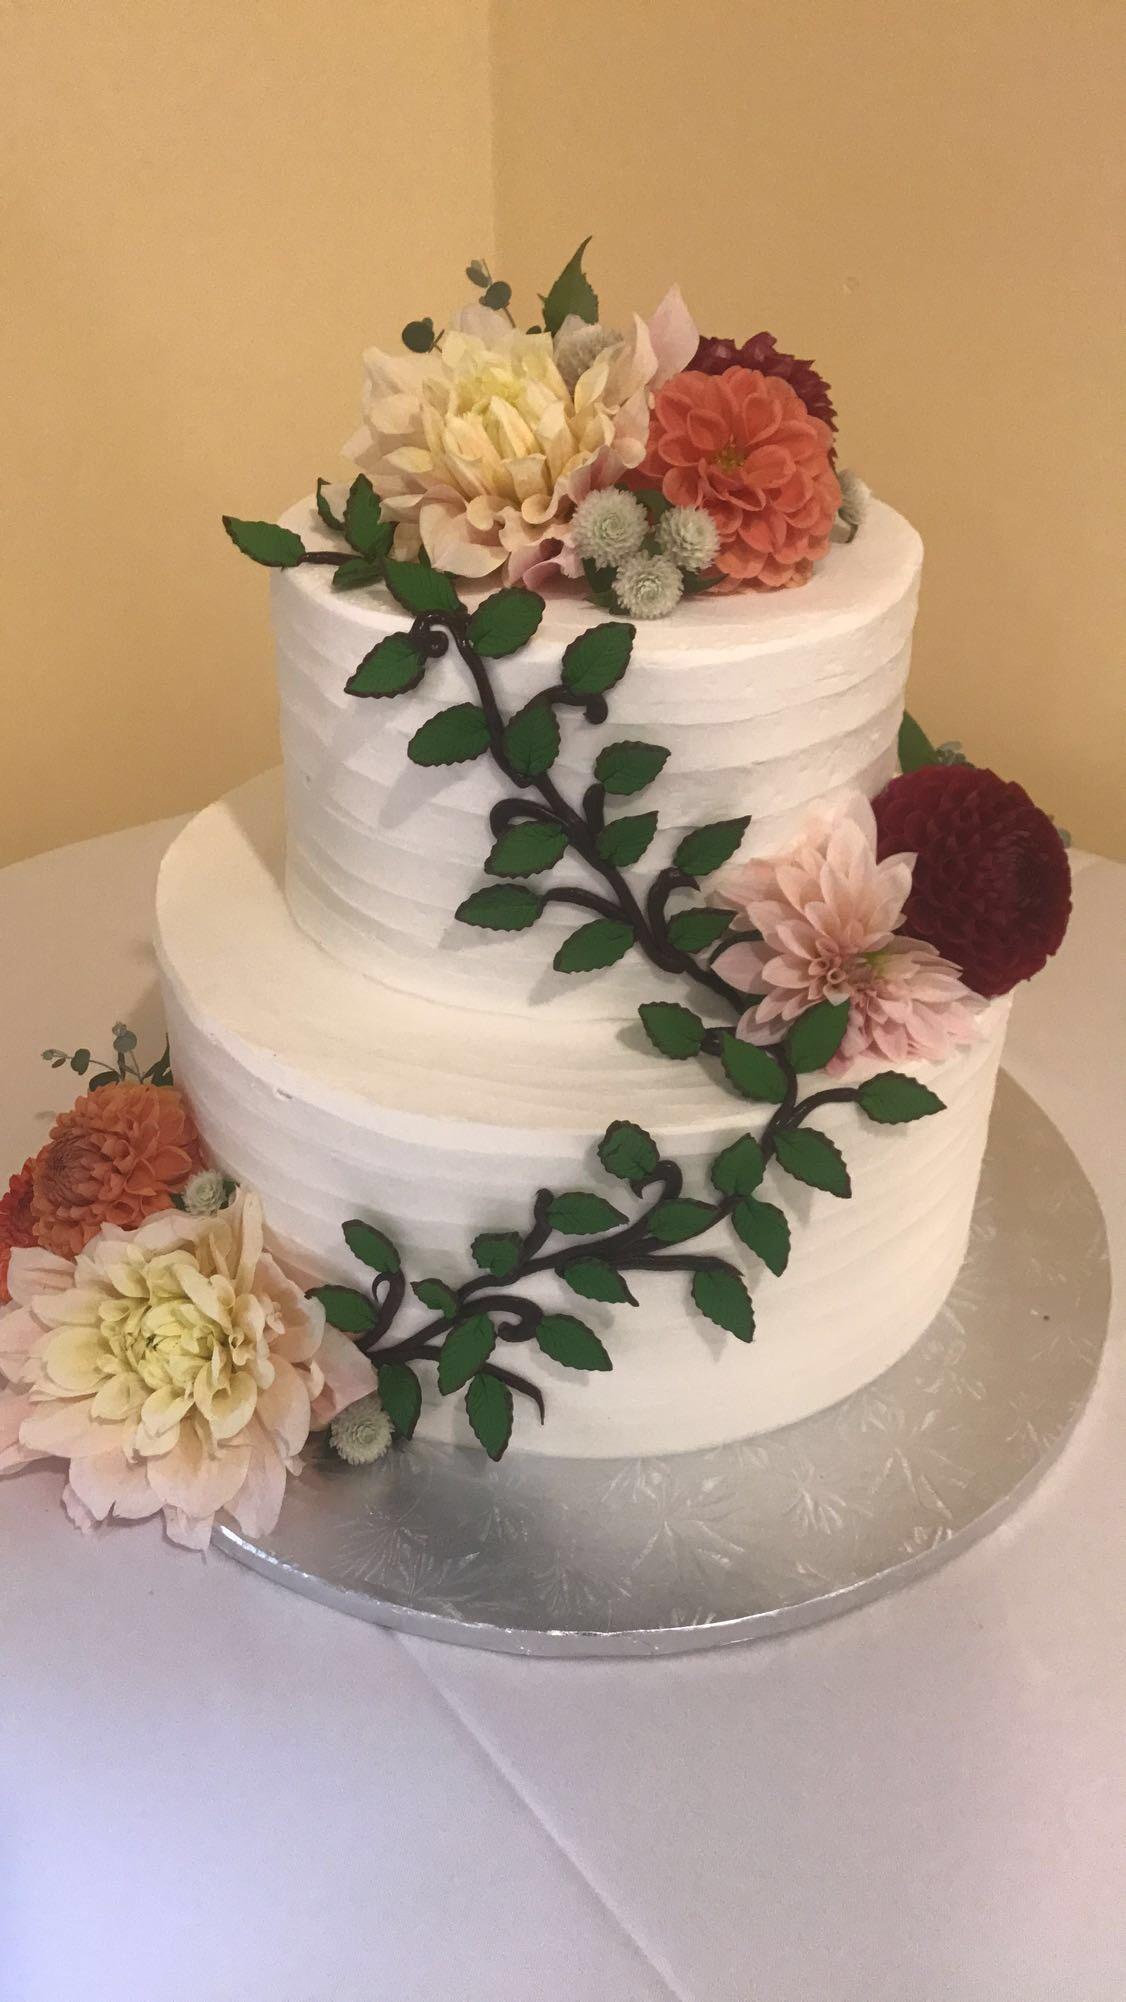 Flowers & Vines Wedding Cake